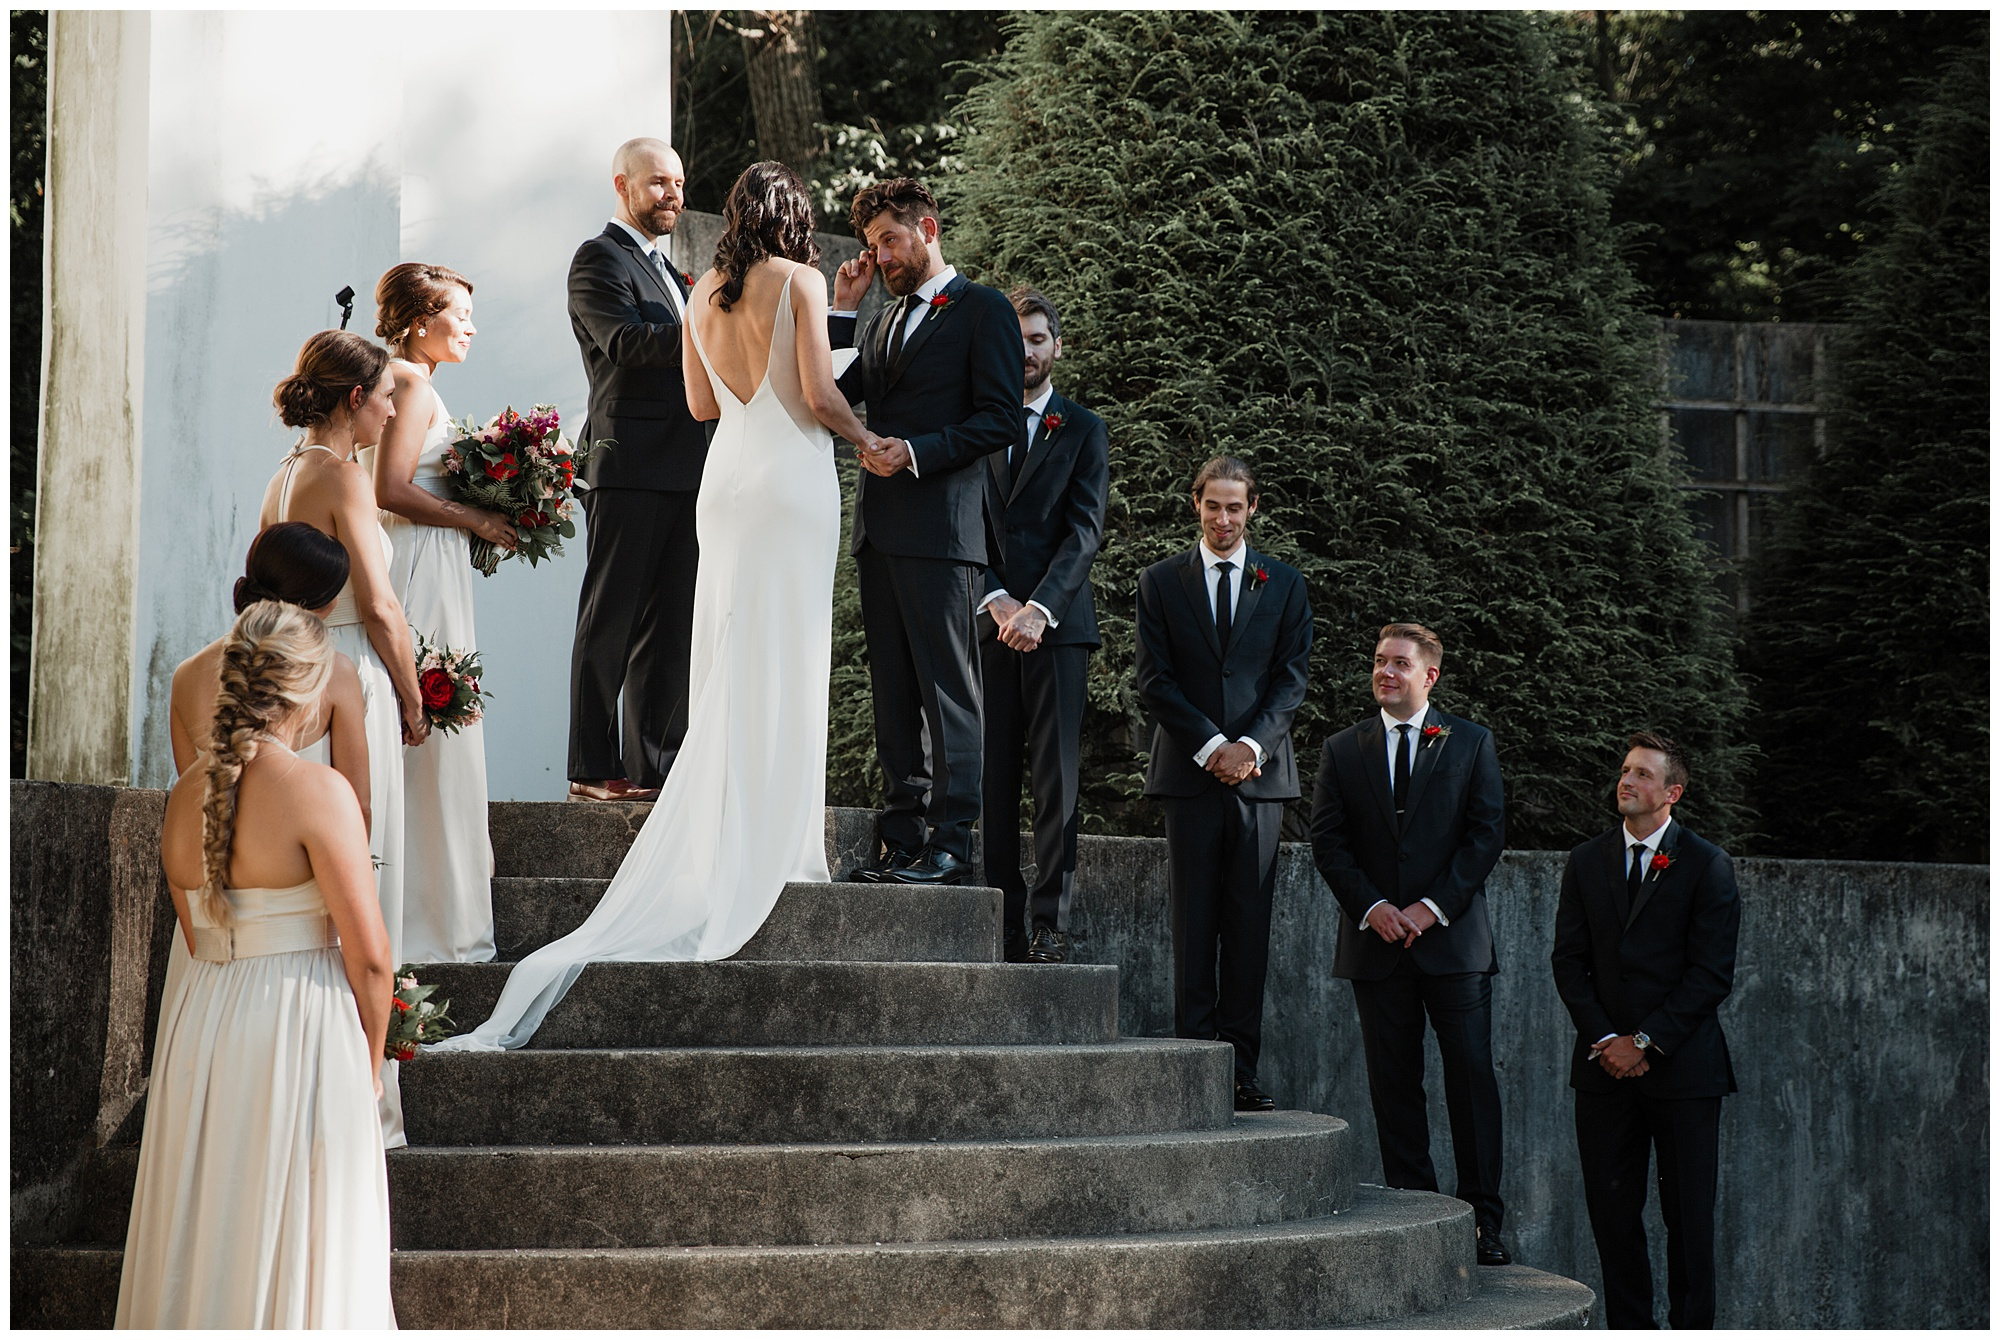 allerton_park_wedding_champaign_il_chicago_wright_photographs_ne_0088.jpg